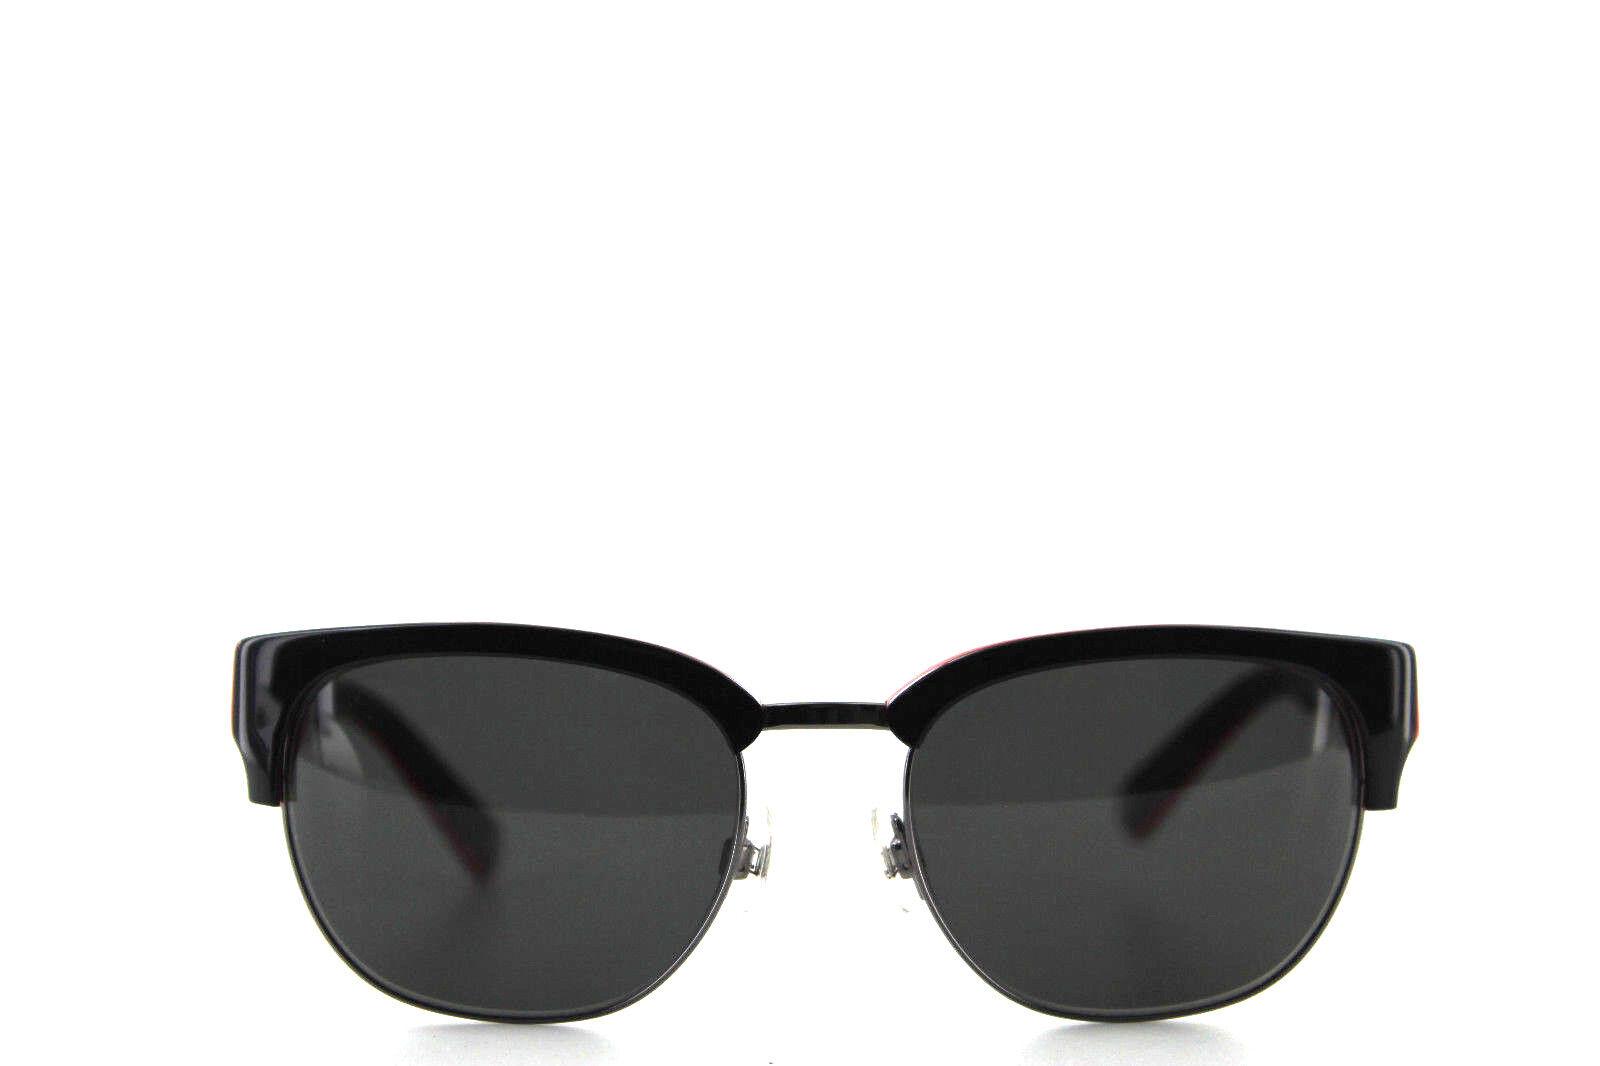 Jette Joop Oval Sonnenbrille     Sunglasses  8500-3 | Exzellente Verarbeitung  d401f4